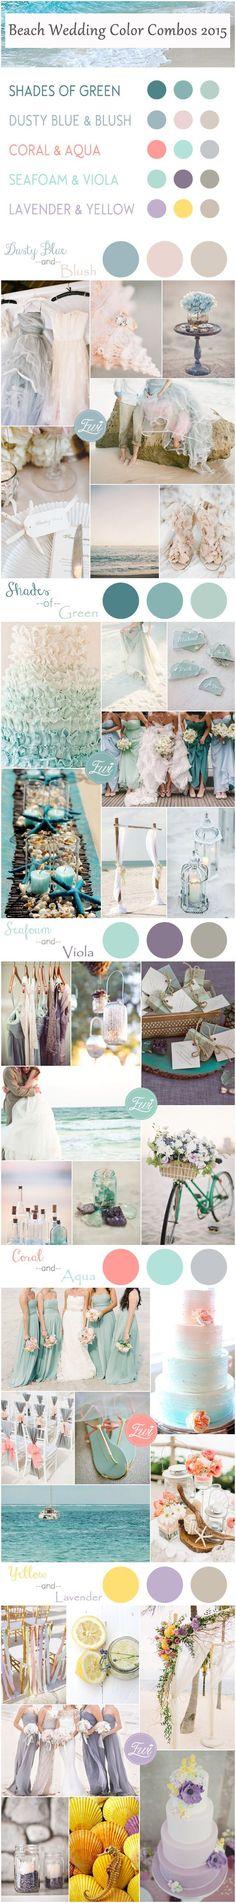 Top 5 Beach Themed Wedding Color Ideas for Summer 2015